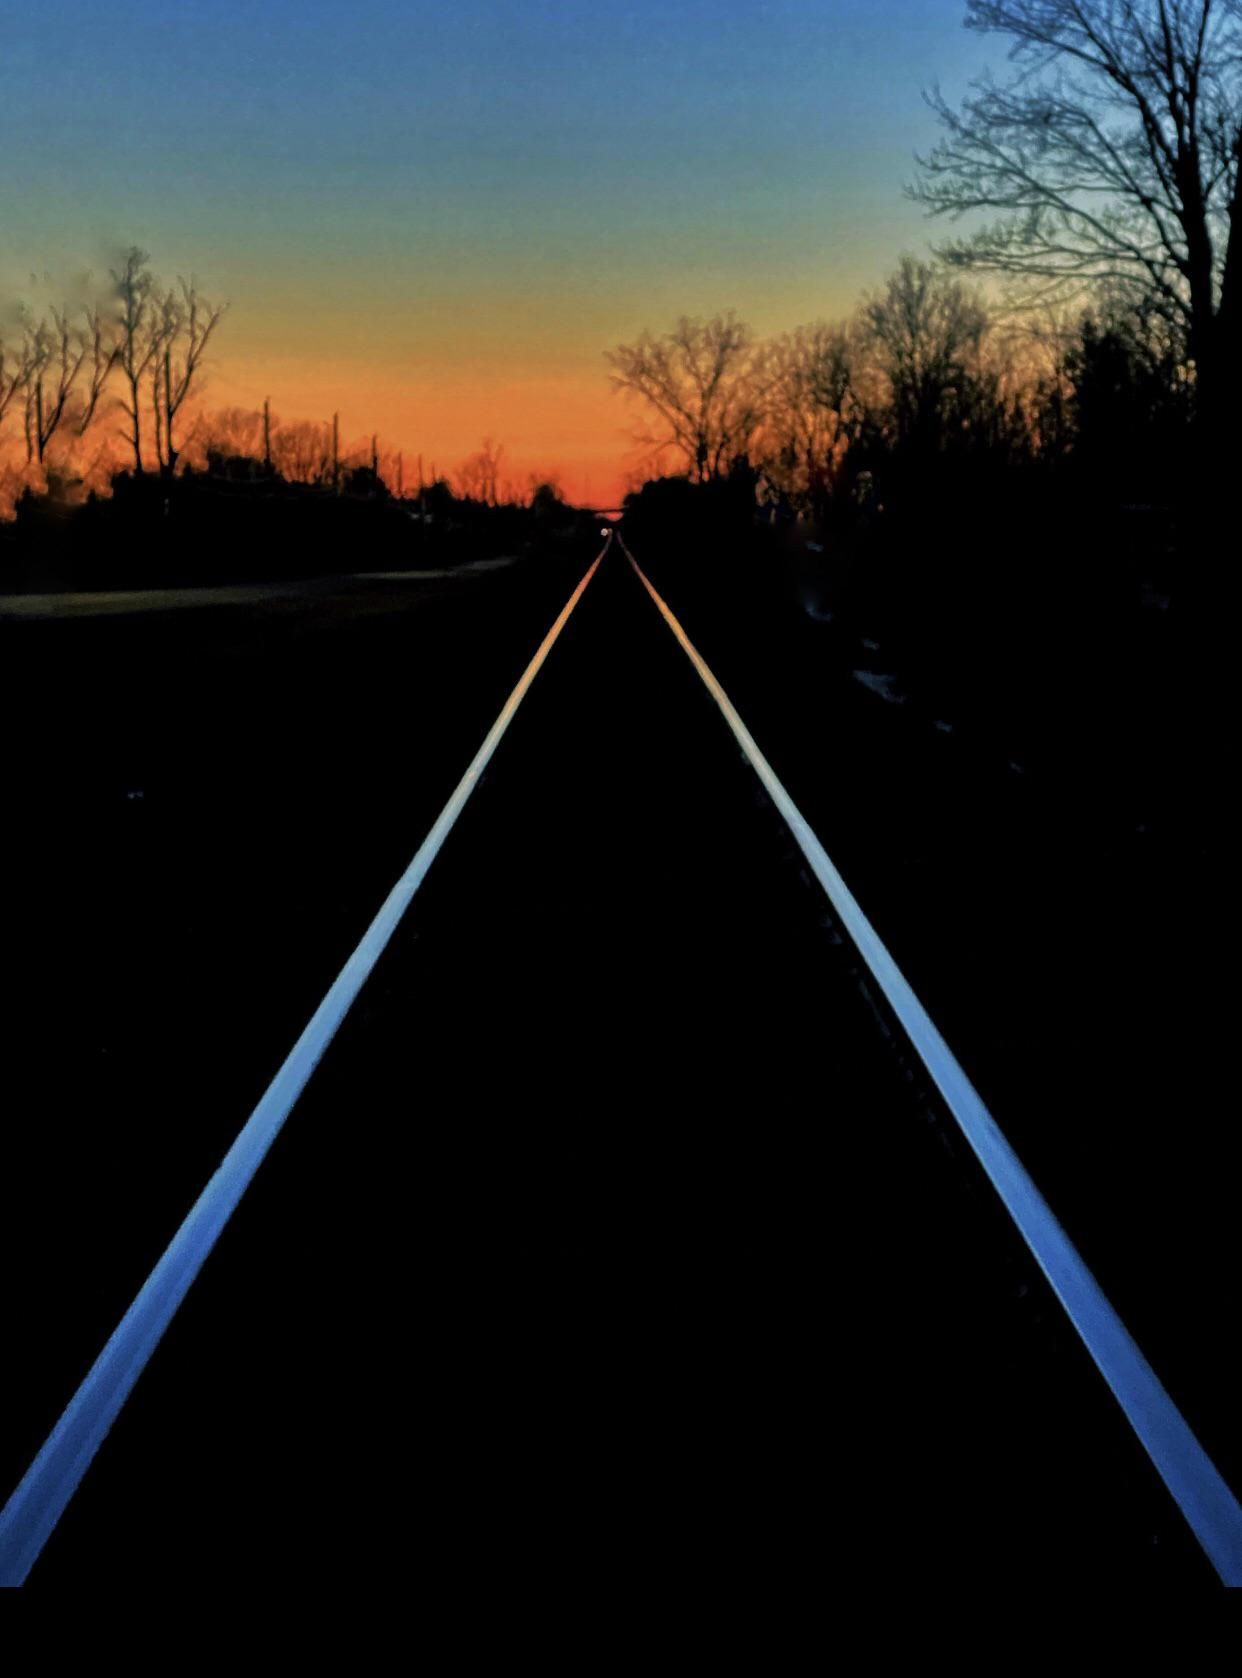 Train tracks at night